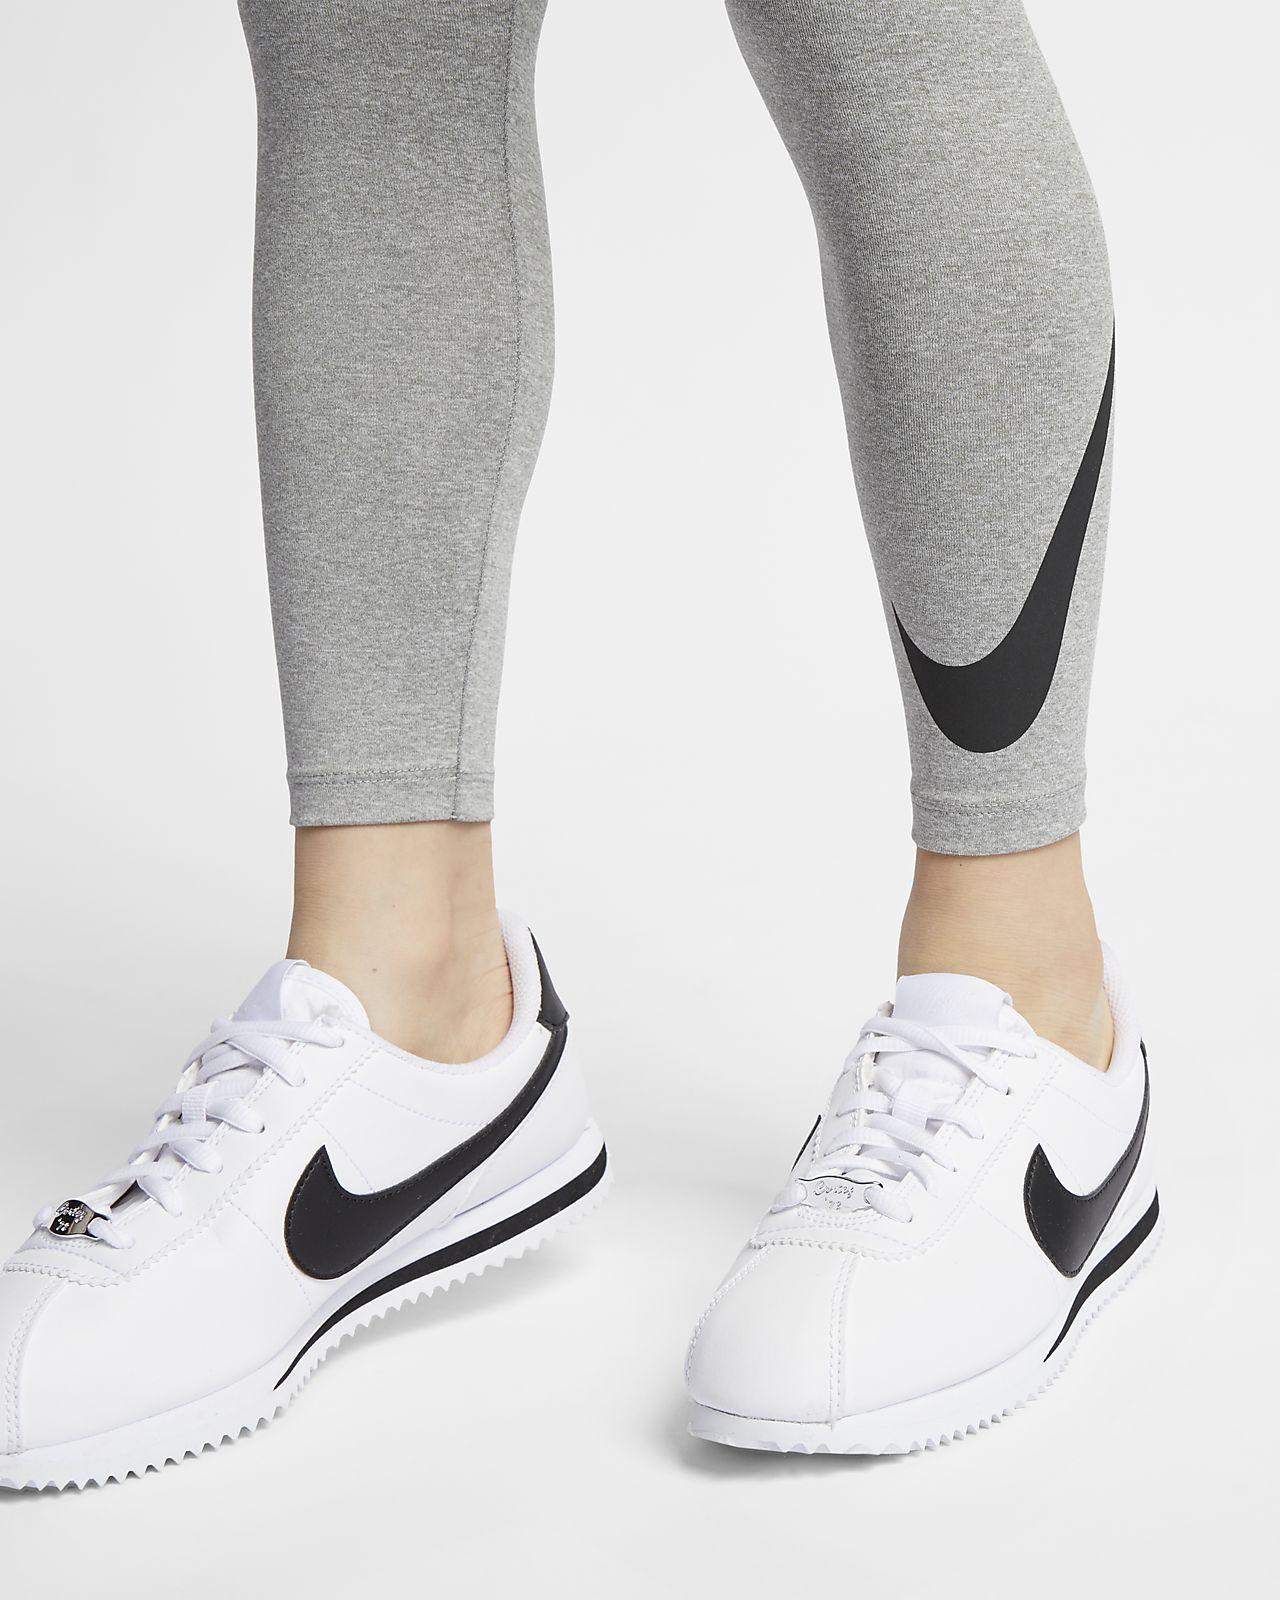 198d070c2a50dd Nike Sportswear Essential Younger Kids' Leggings. Nike.com LU